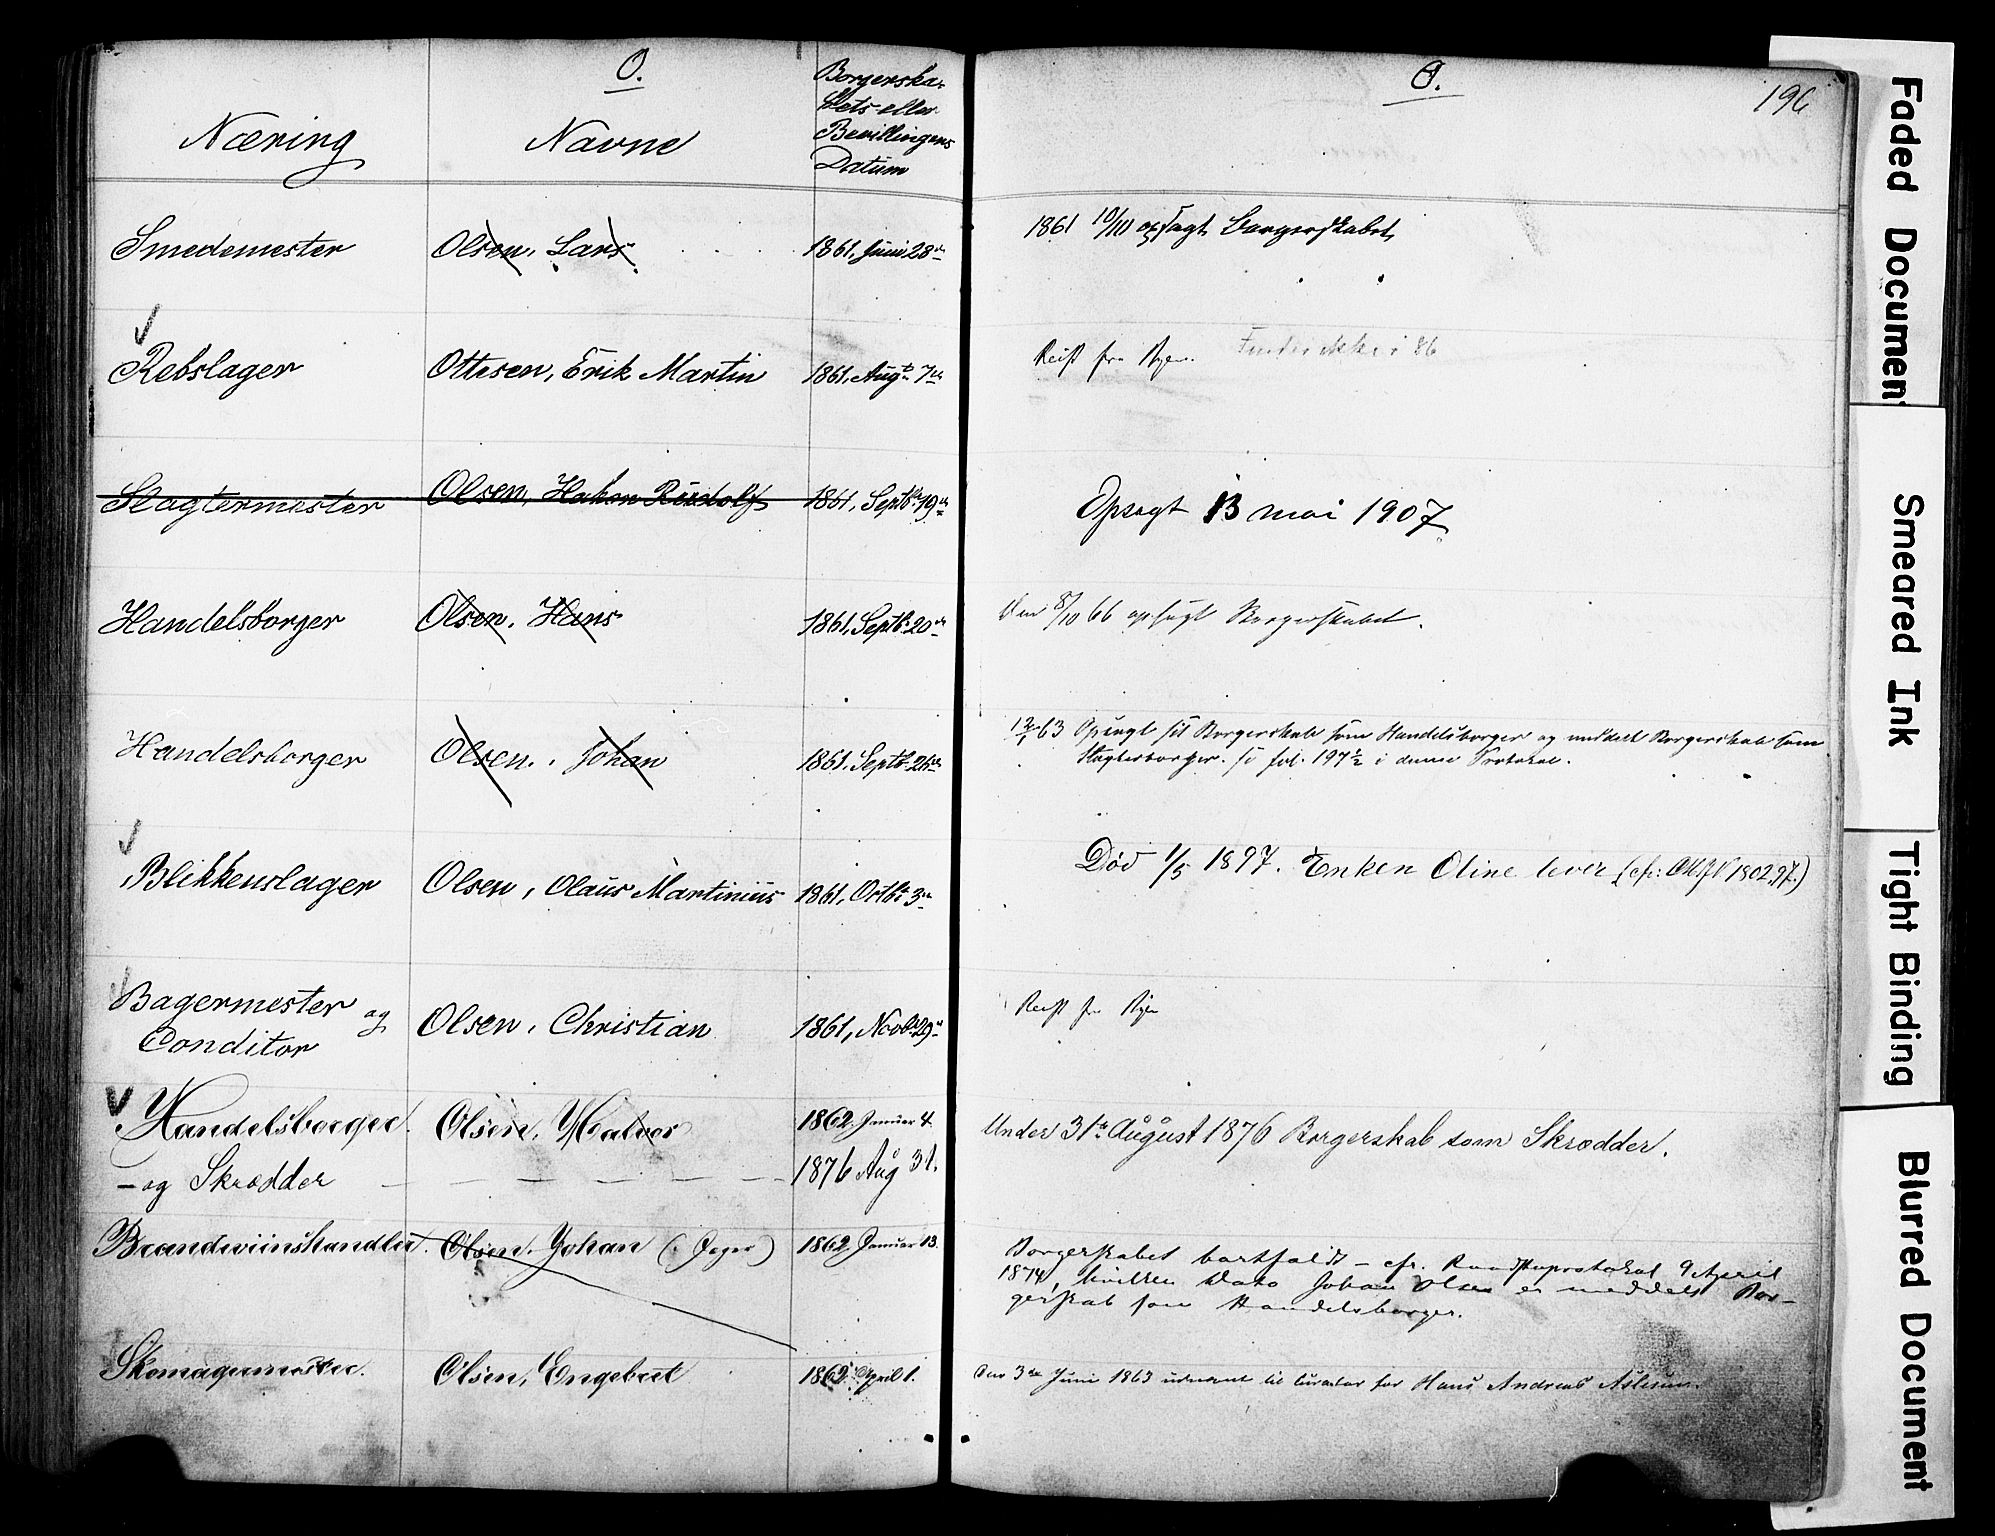 SAO, Kristiania magistrat, F/Fb/L0004: Borgerrulle, 1860-1879, s. 198